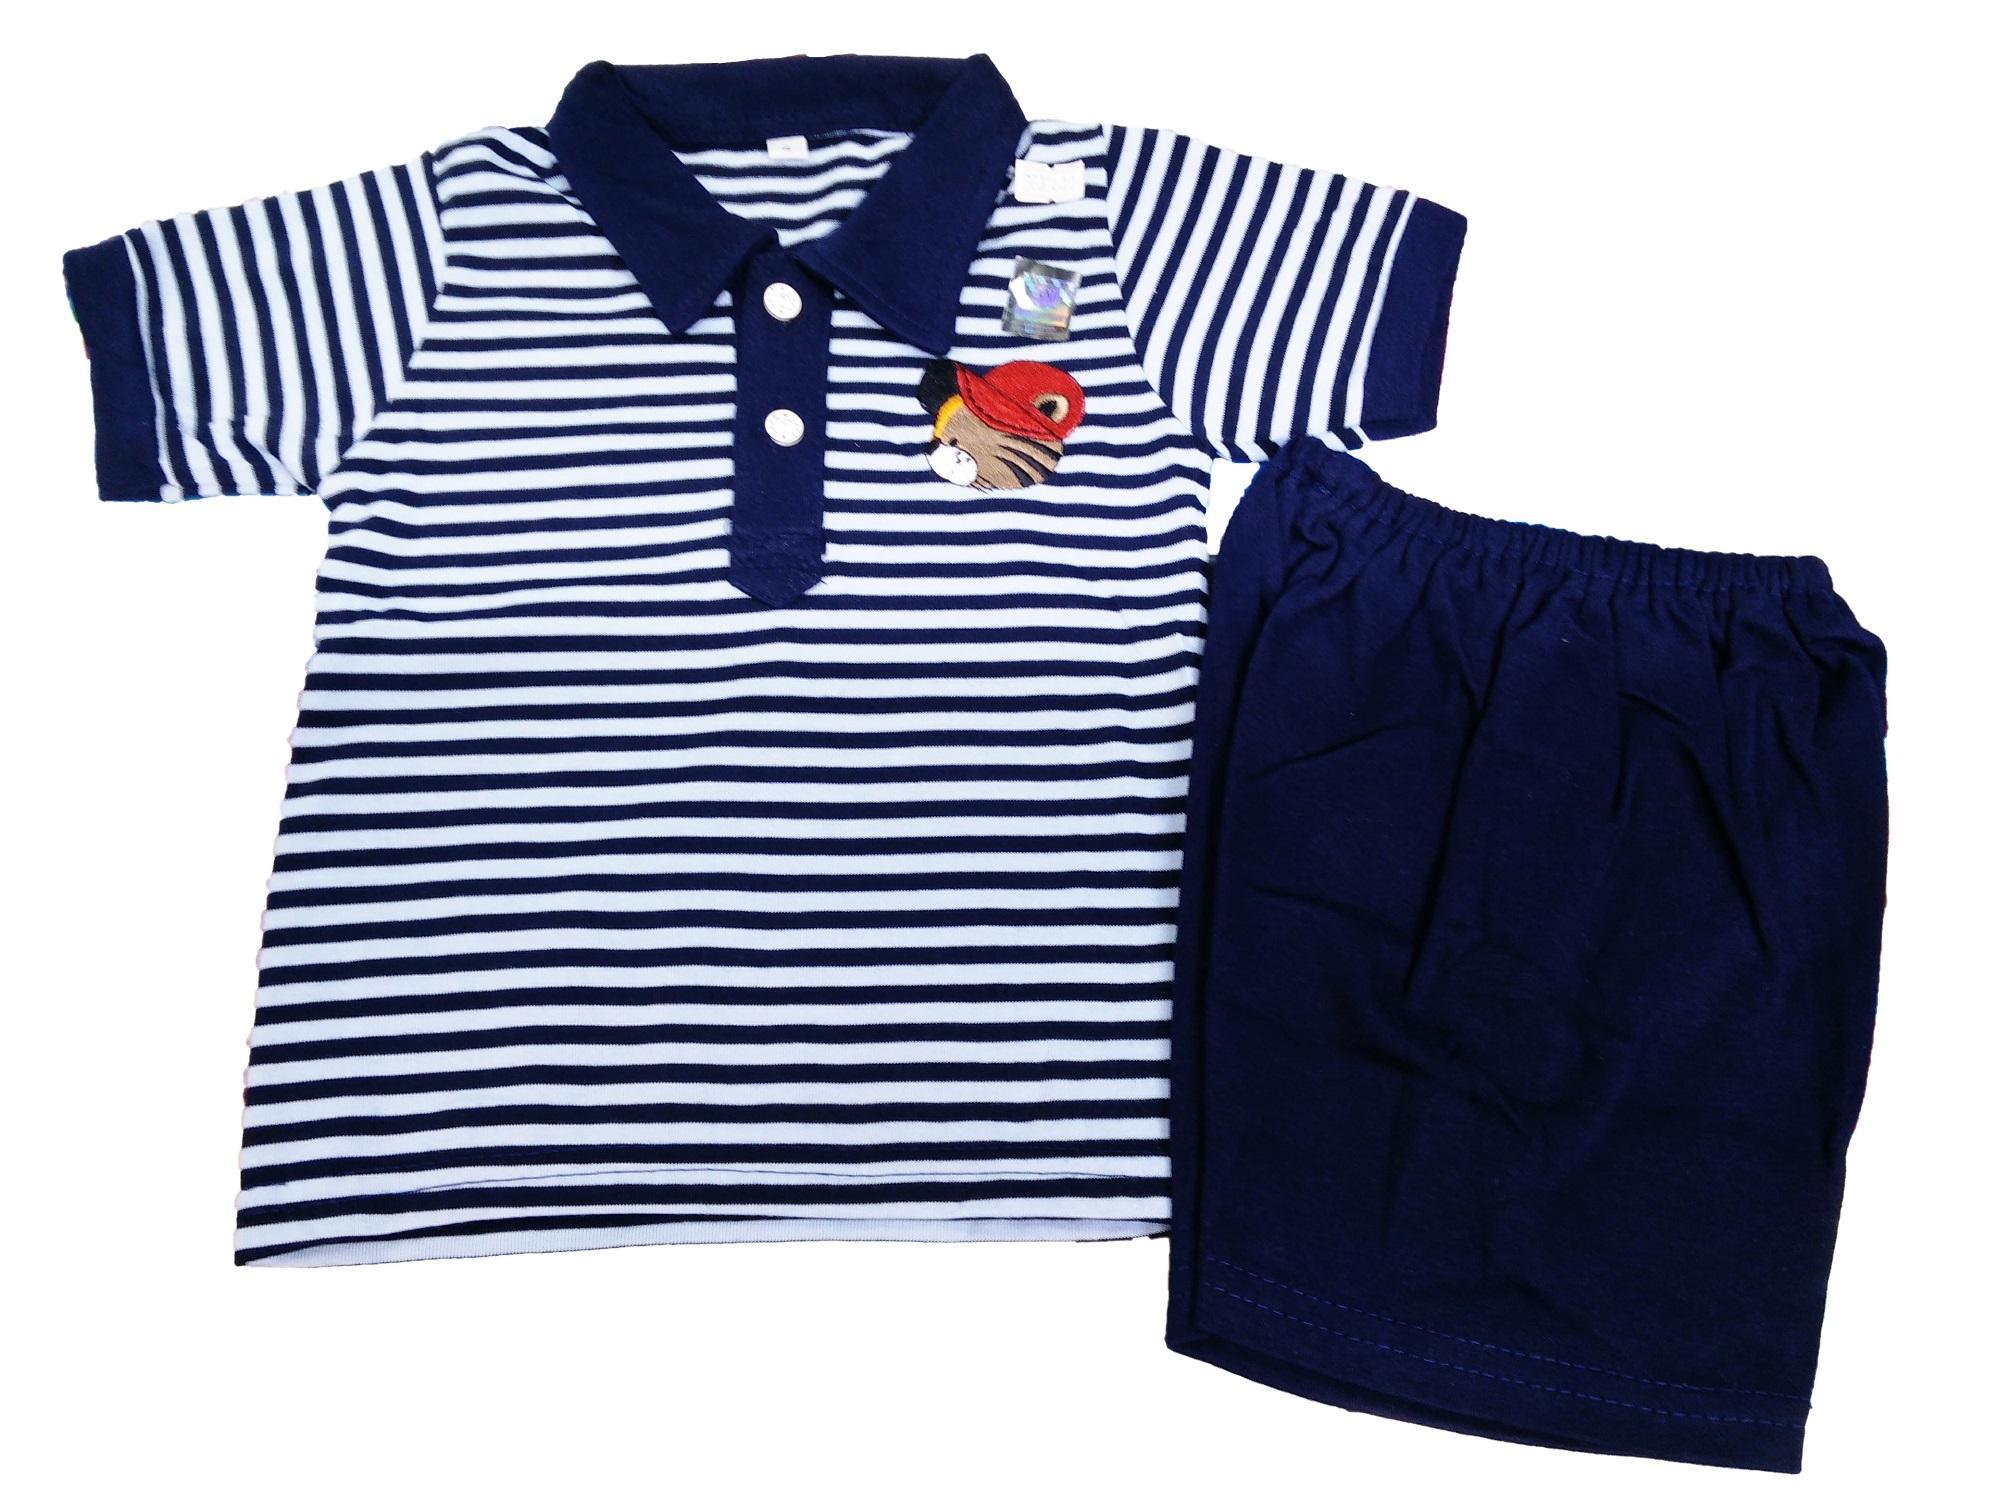 Kelebihan Setelan Pendek Bayi Uaka Topicat Terkini Daftar Harga Baju S03